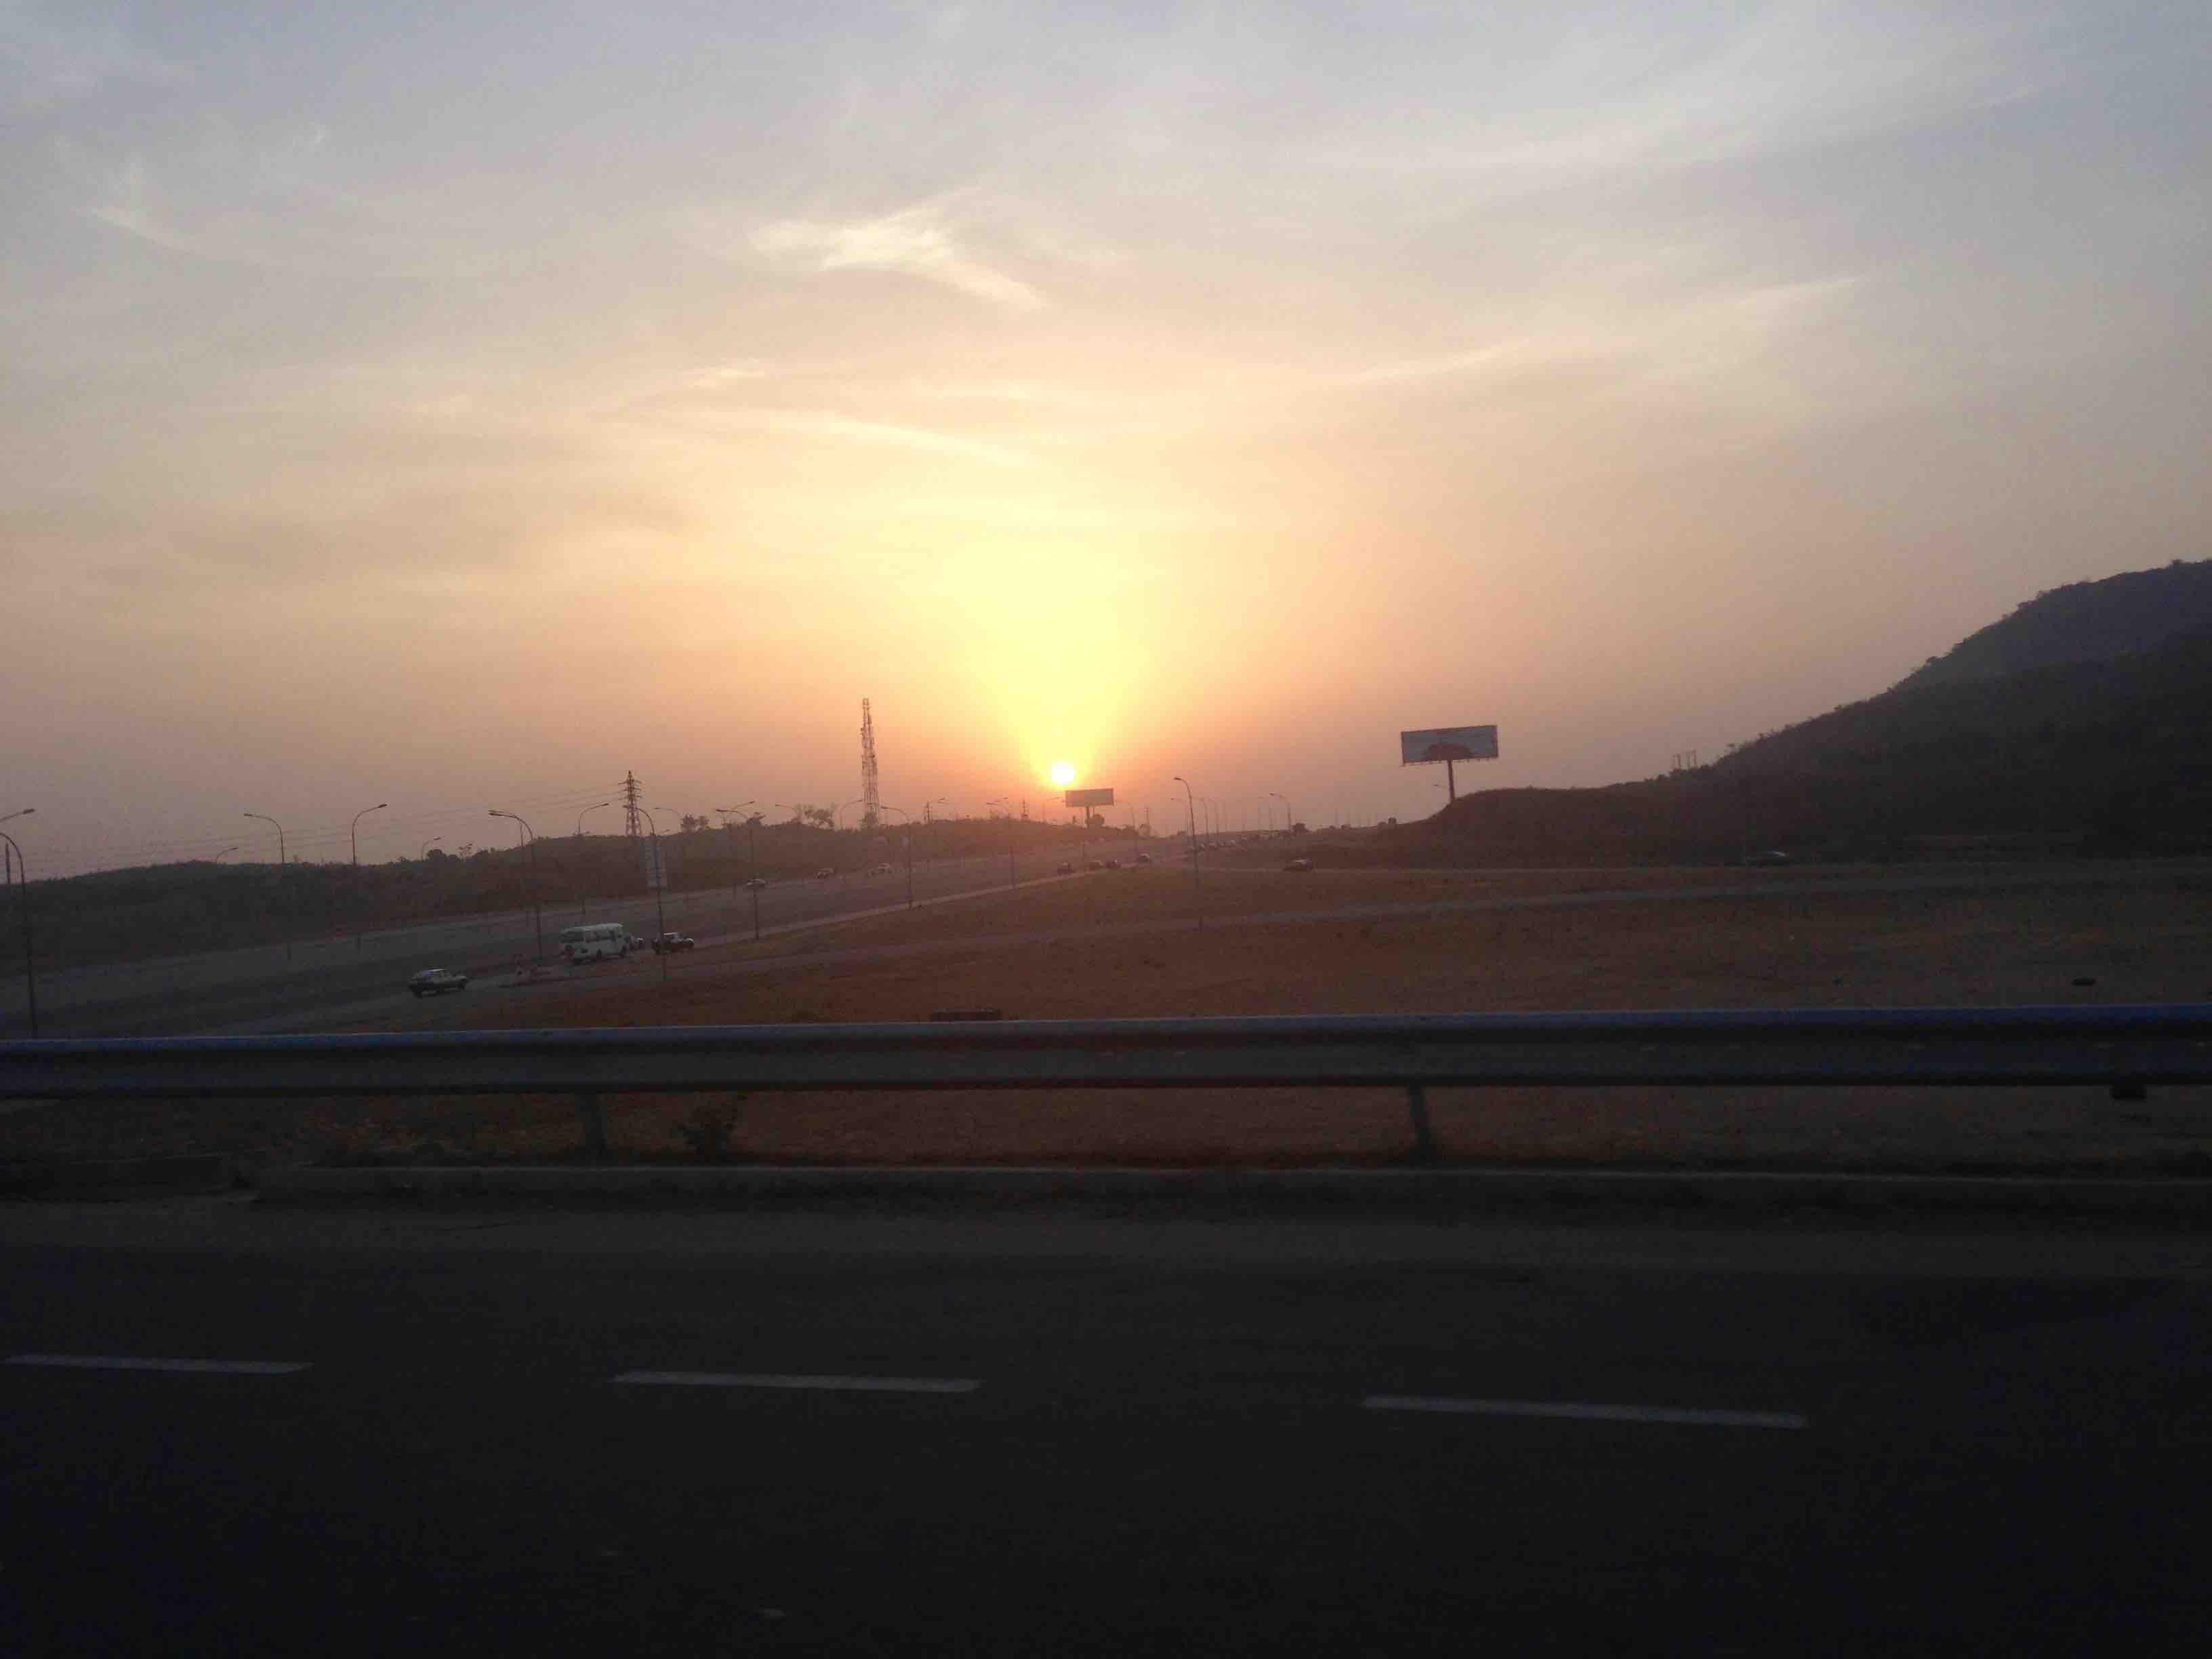 Sunrise, Airport Road, Abuja, Nigeria. #JujuFilms